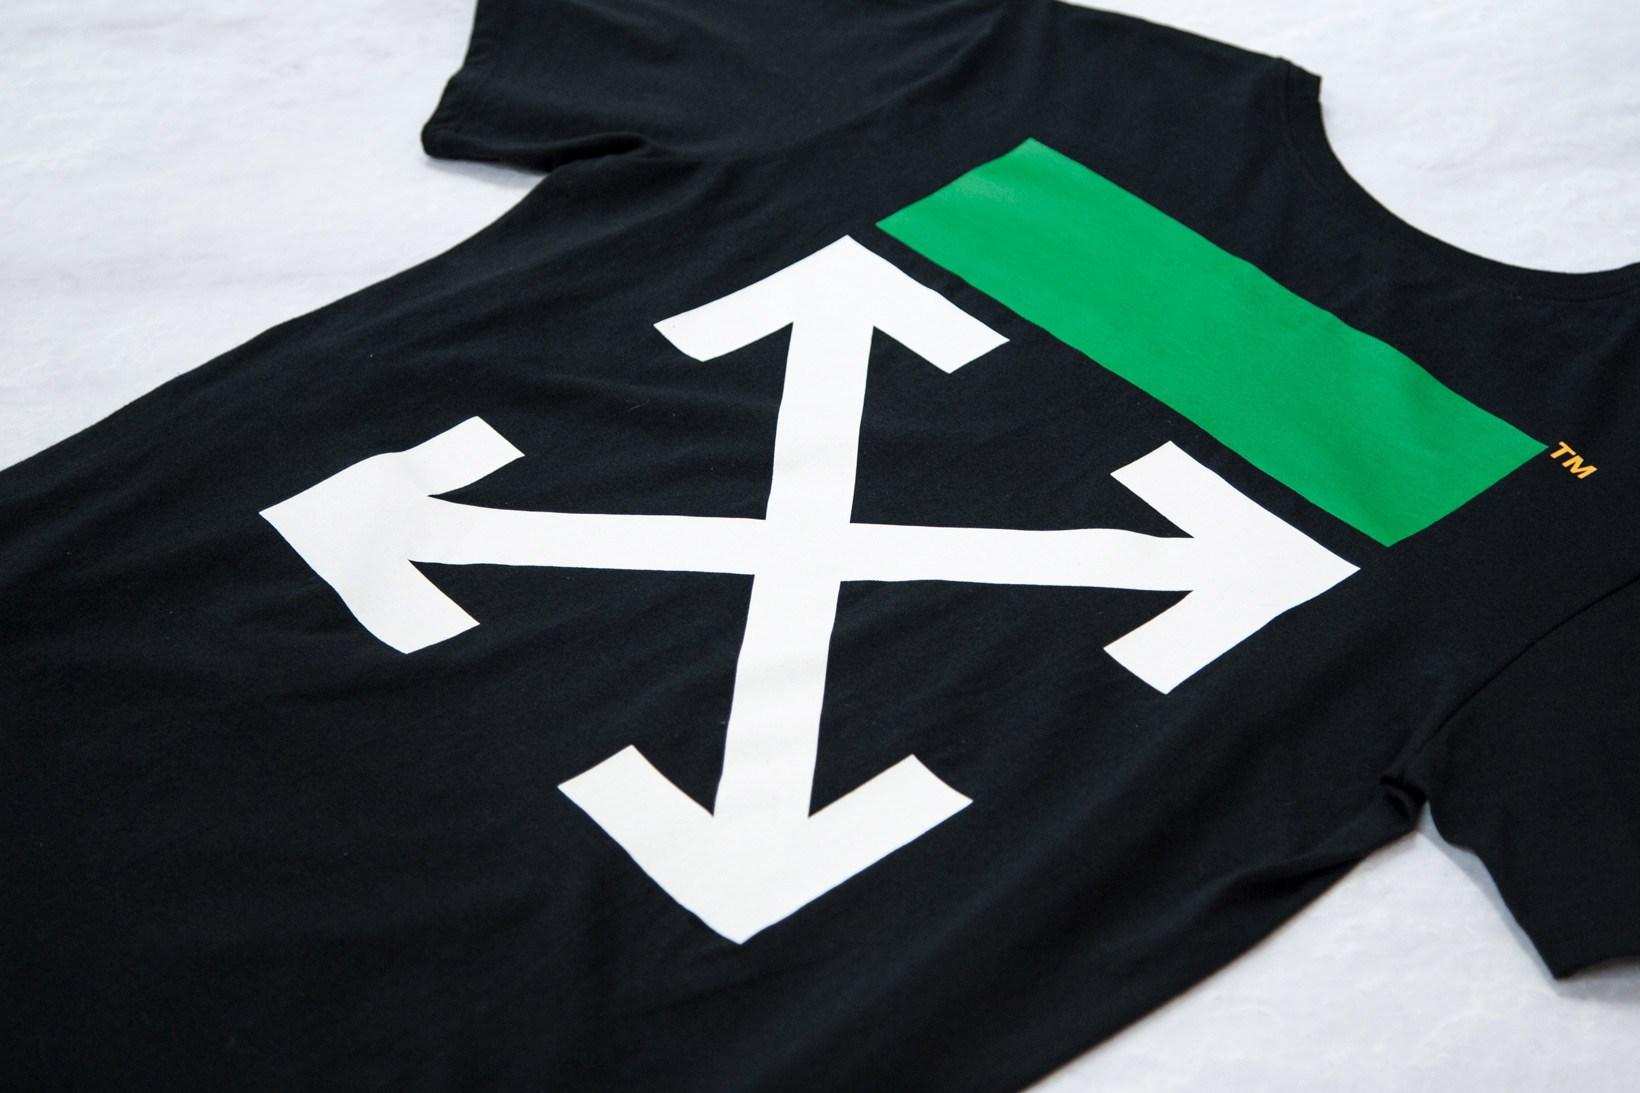 nike-off-white-virgil-abloh-equality-t-shirt-7